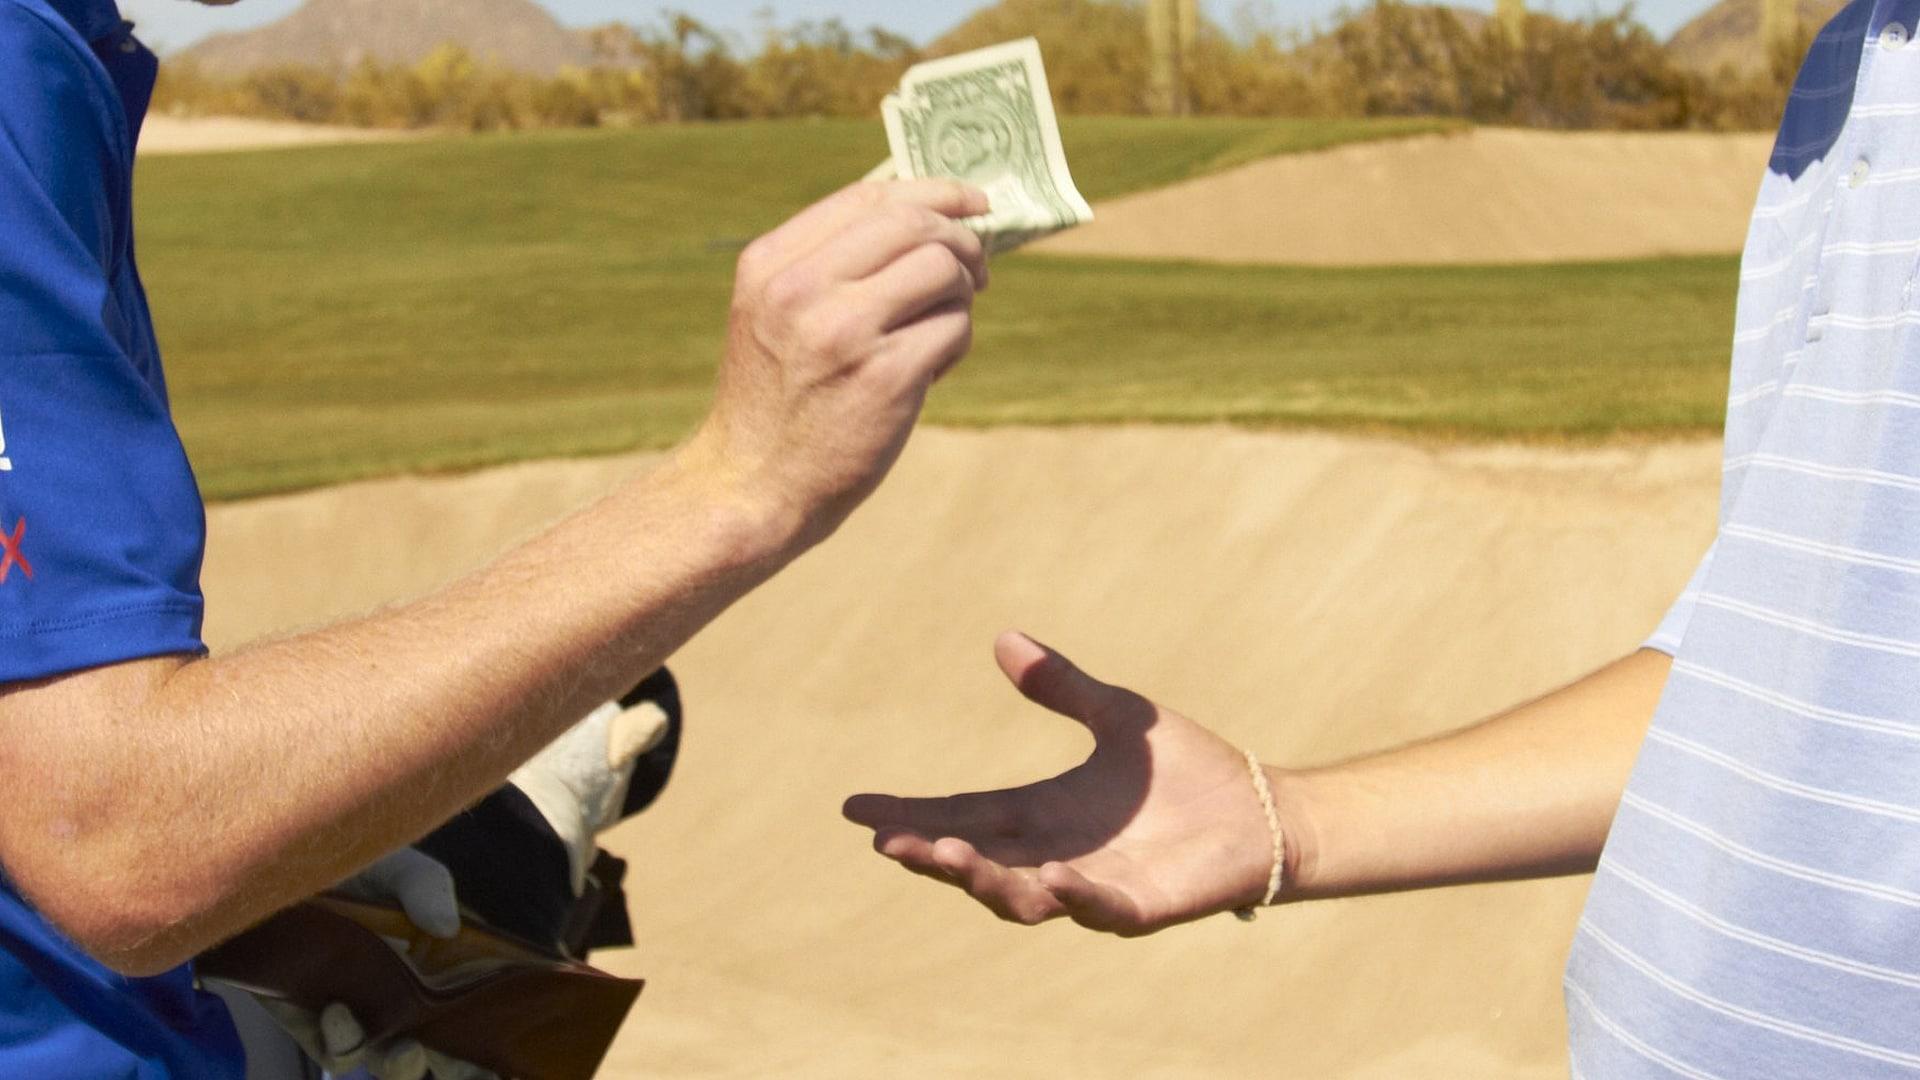 Pga Tour Expands Anti Gambling Reach Golf Channel